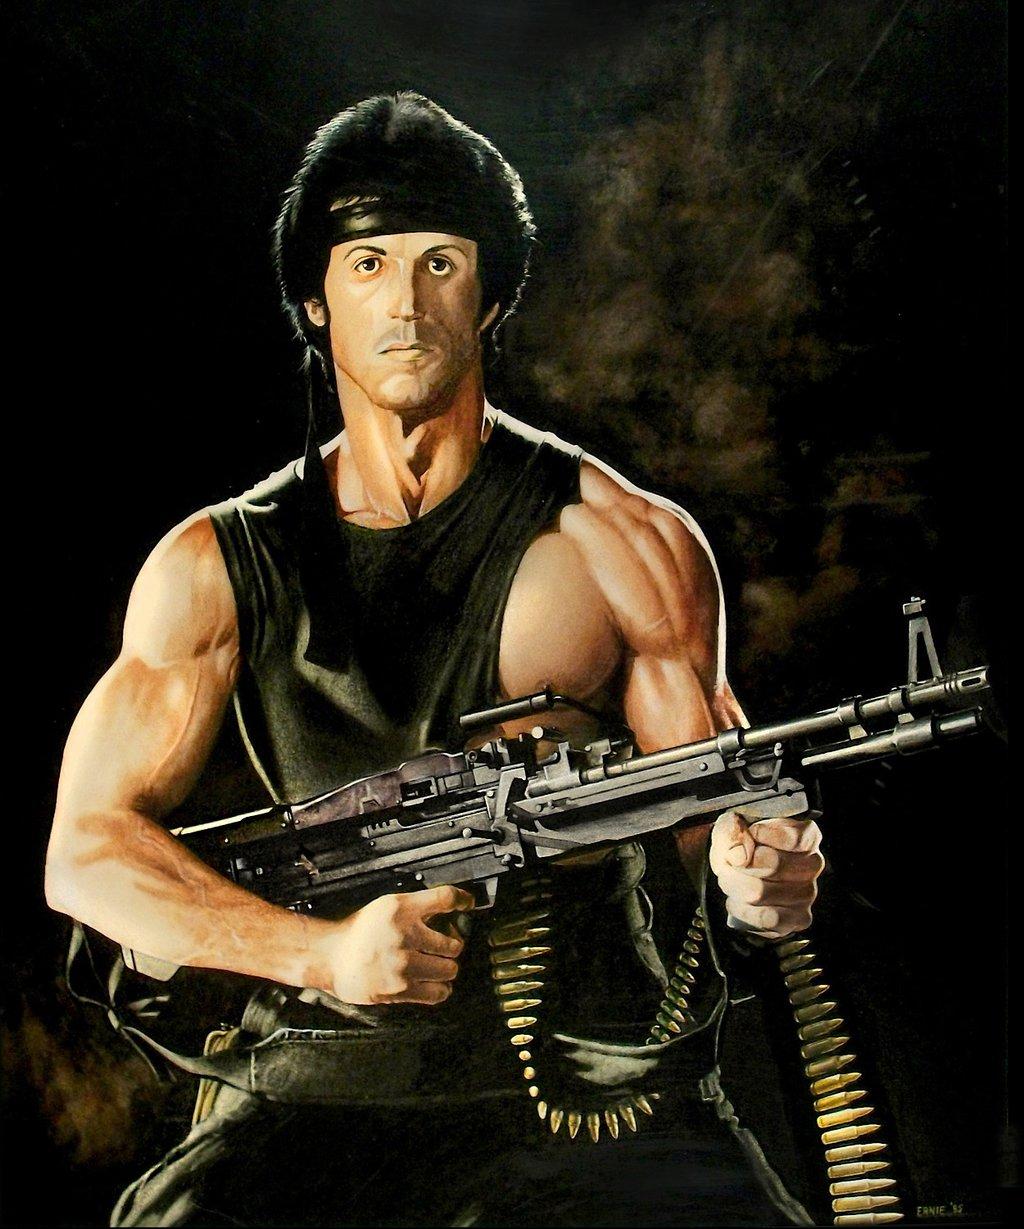 Drawn weapon rambo DeviantArt Ernimator Ernimator Rambo by